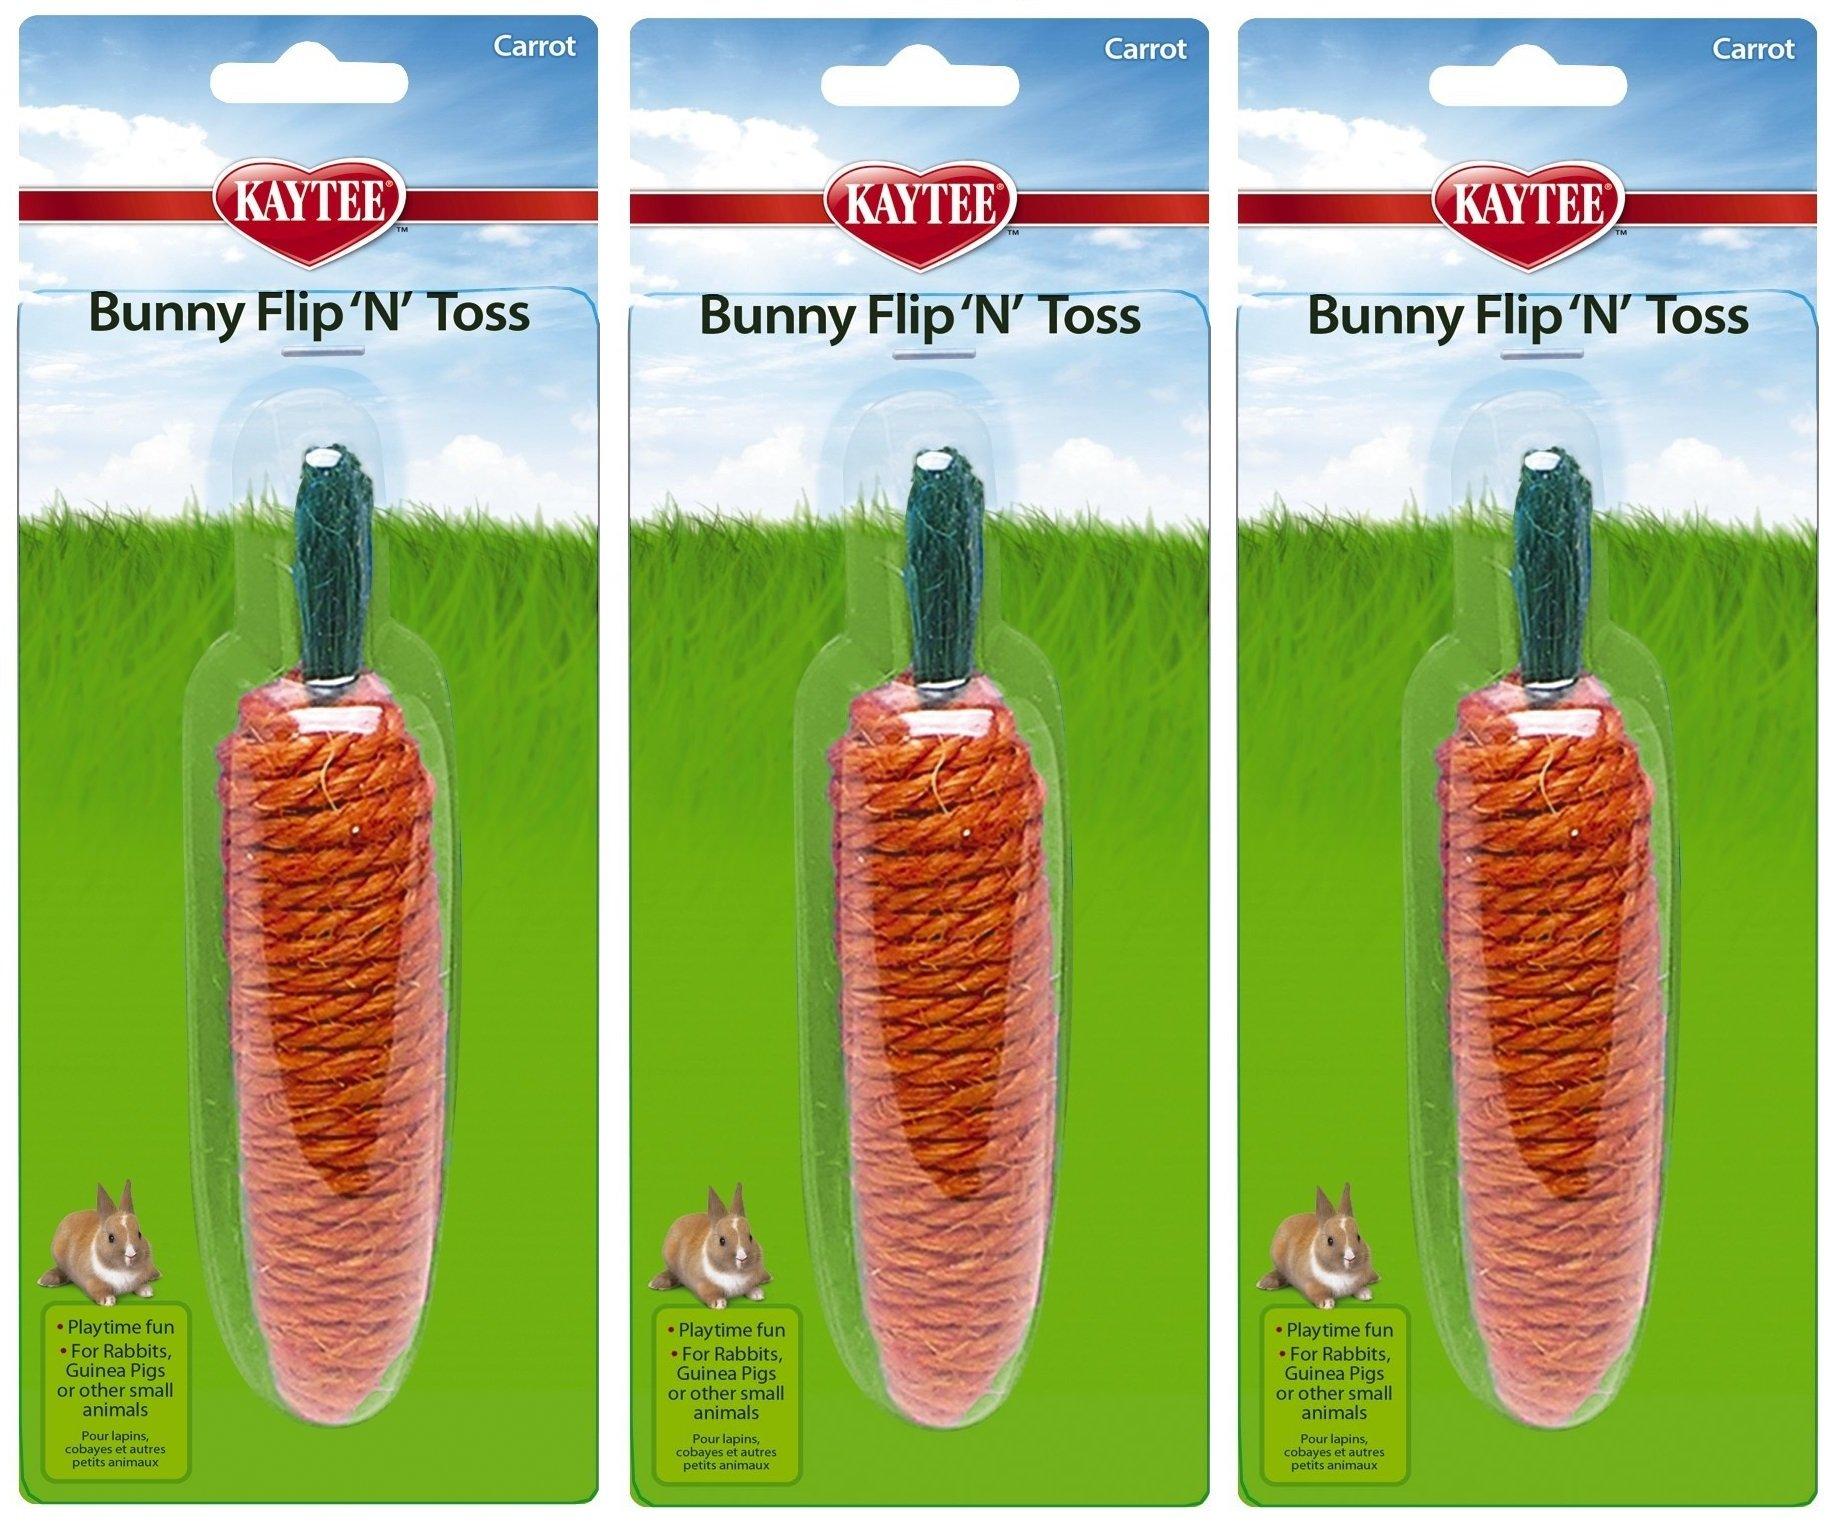 Superpet Bunny Flip N Toss Carrot (Pack of 3) by Kaytee (Image #1)